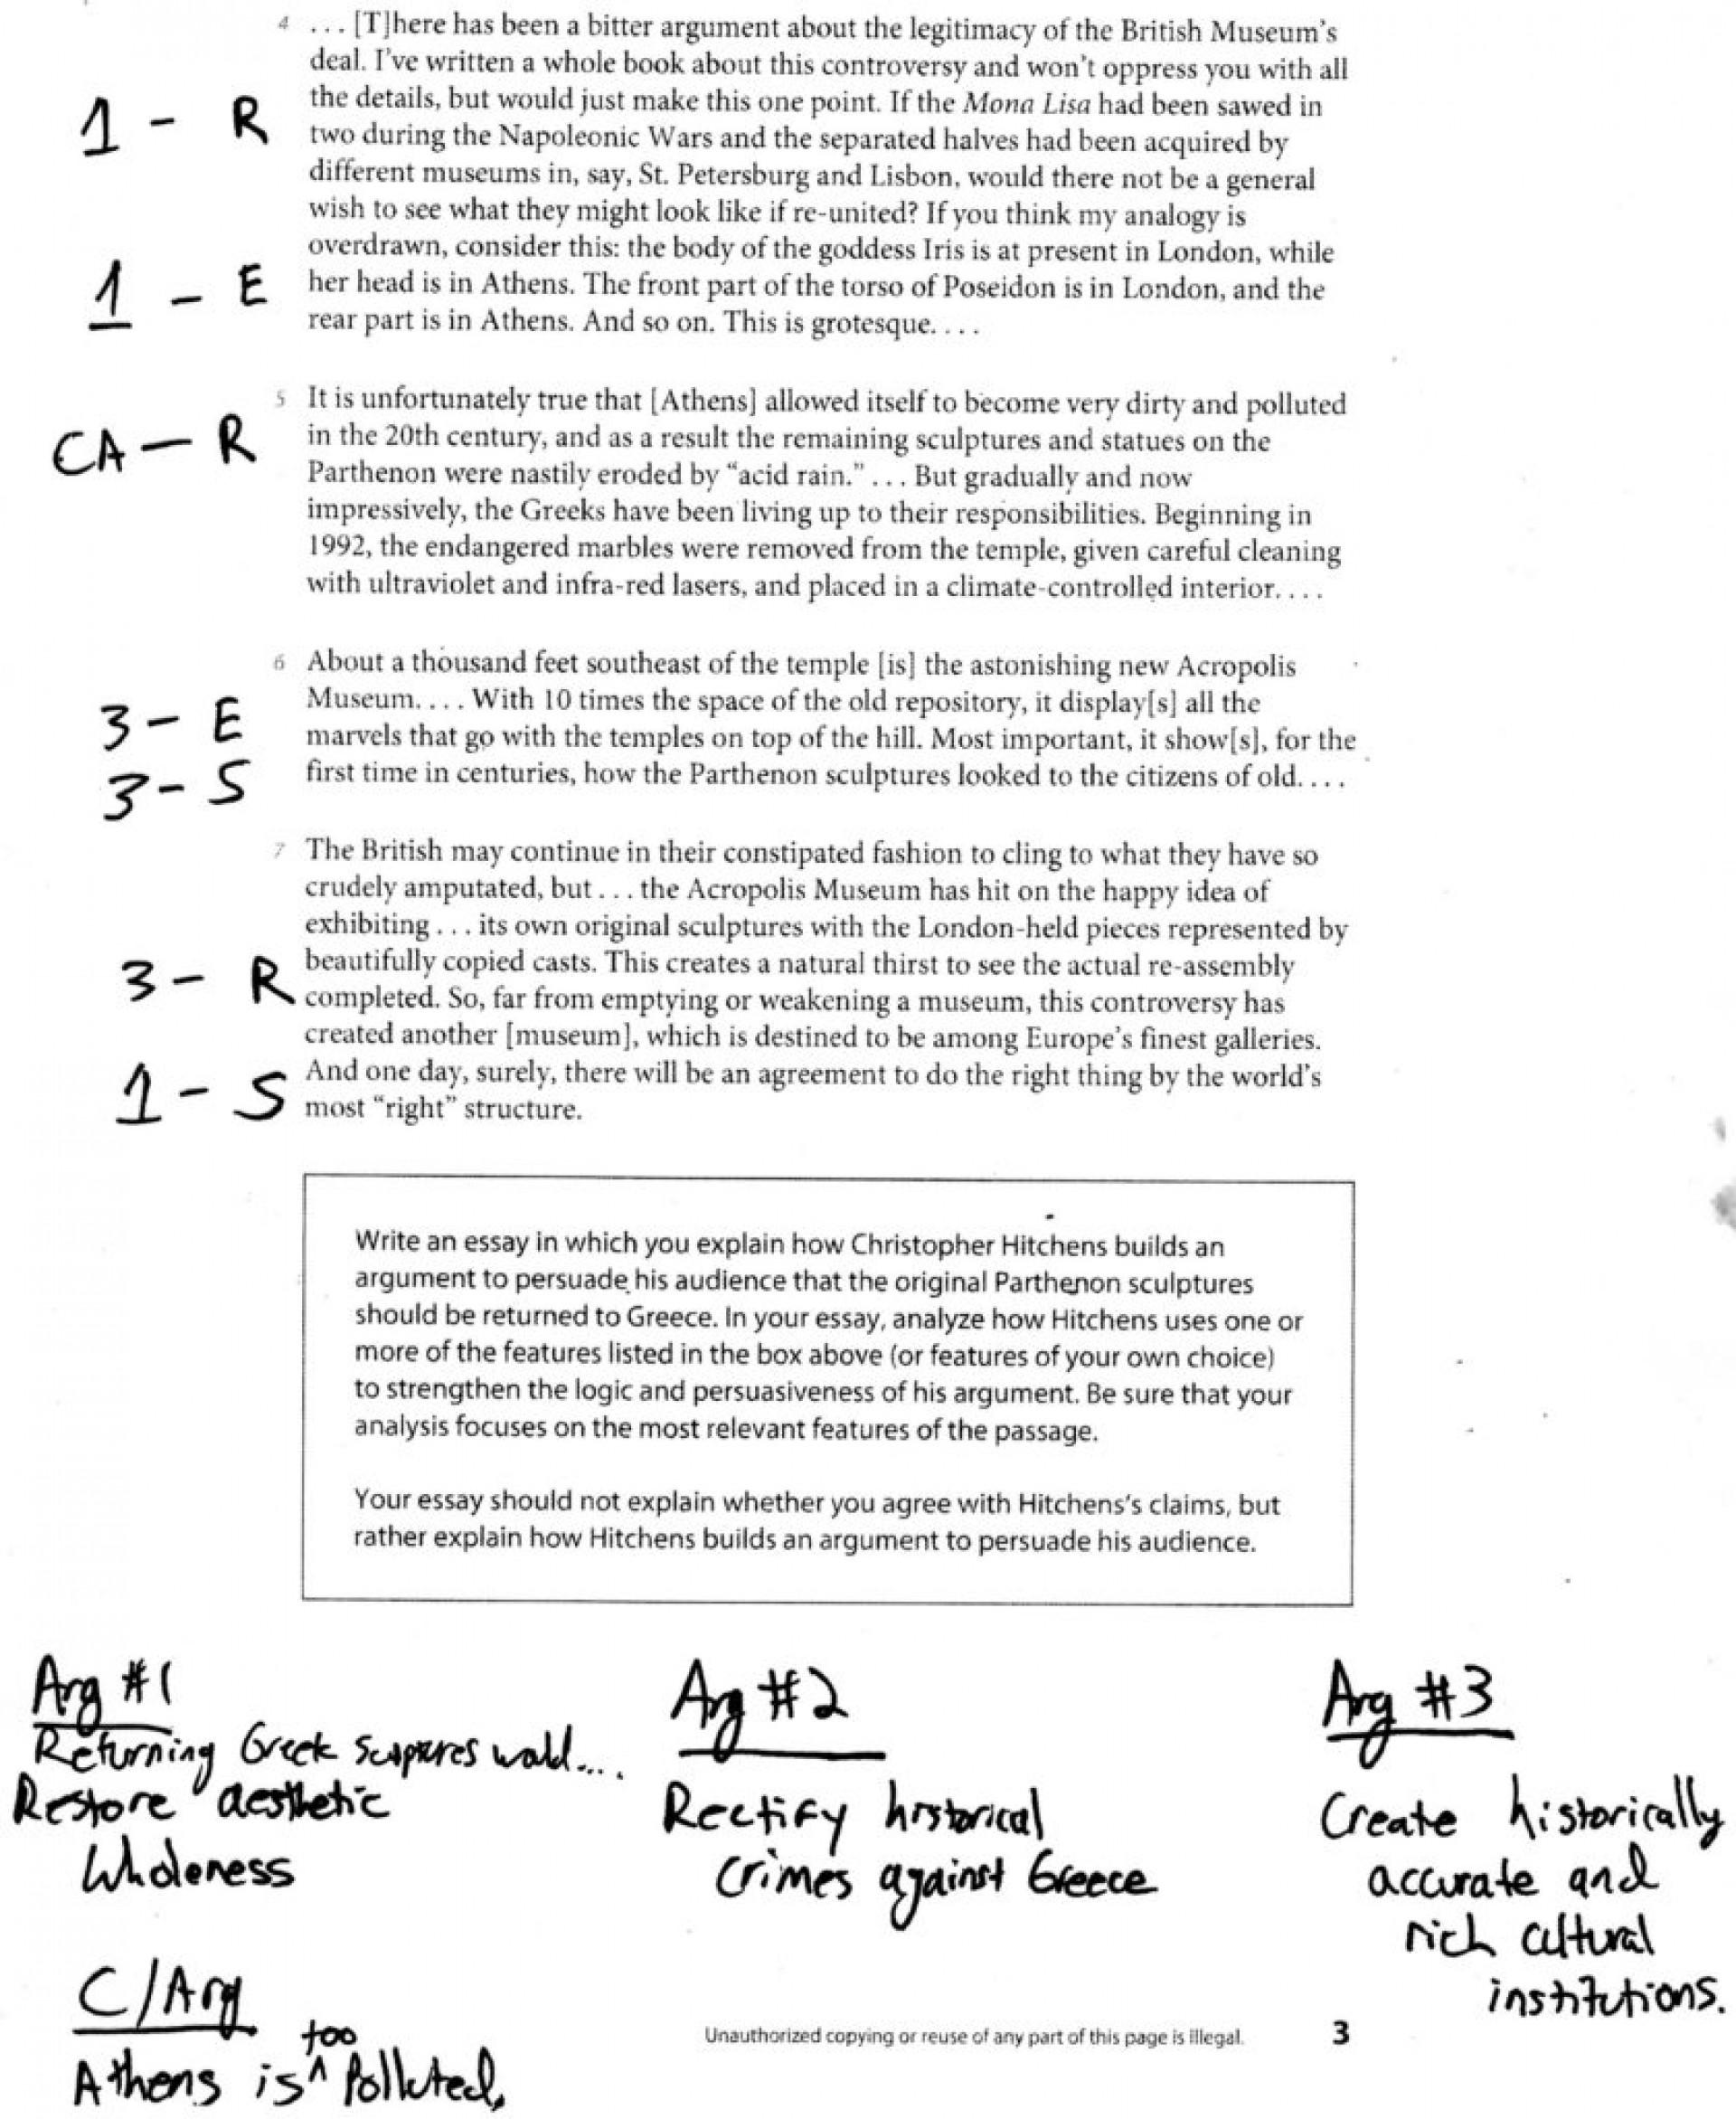 017 Sat Essay Sample Img103 839x1024 Wondrous Pdf 1920